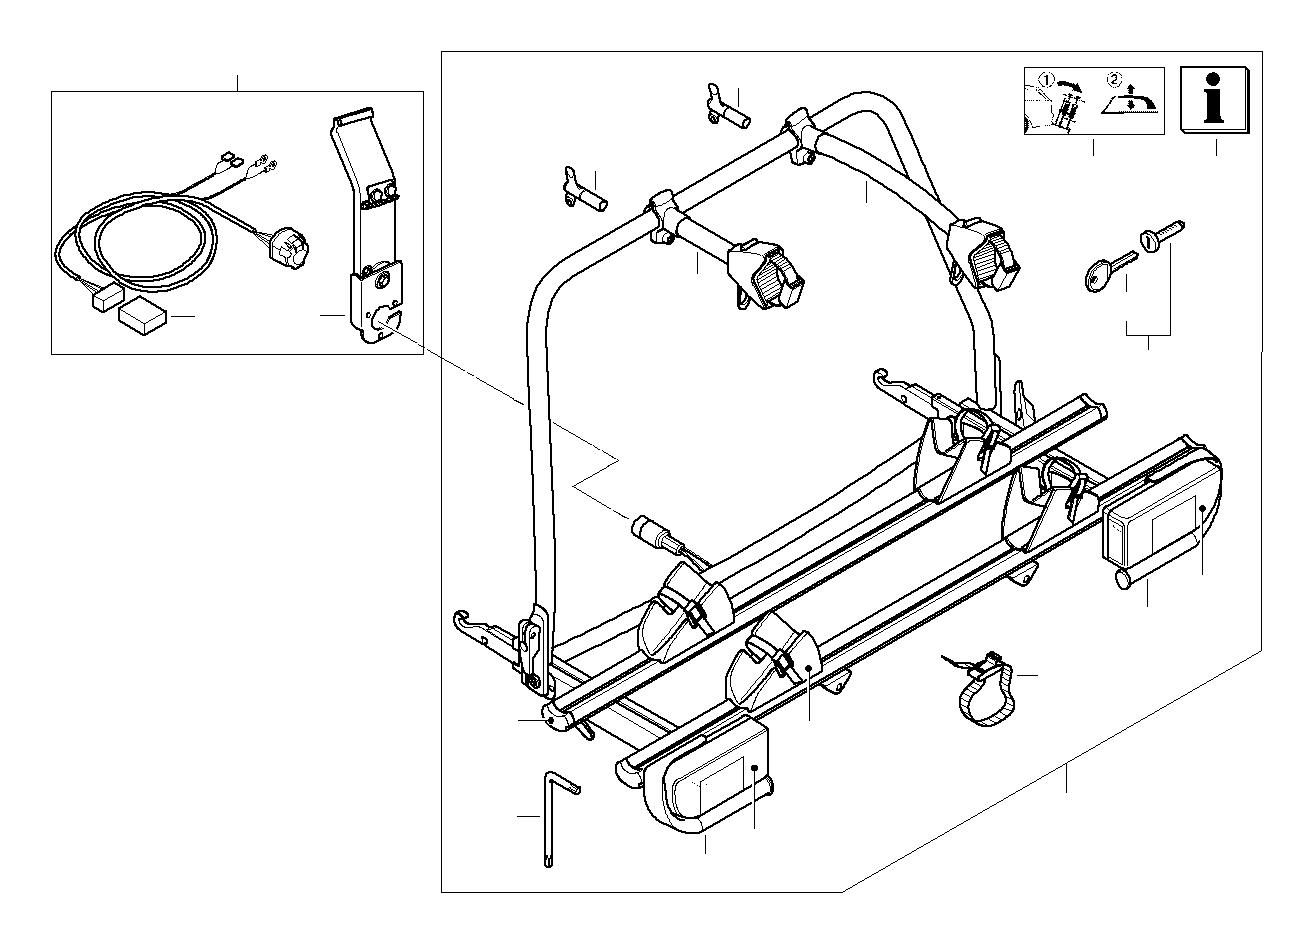 Bmw 135i Rear Light Right Alpina Rack Coupe